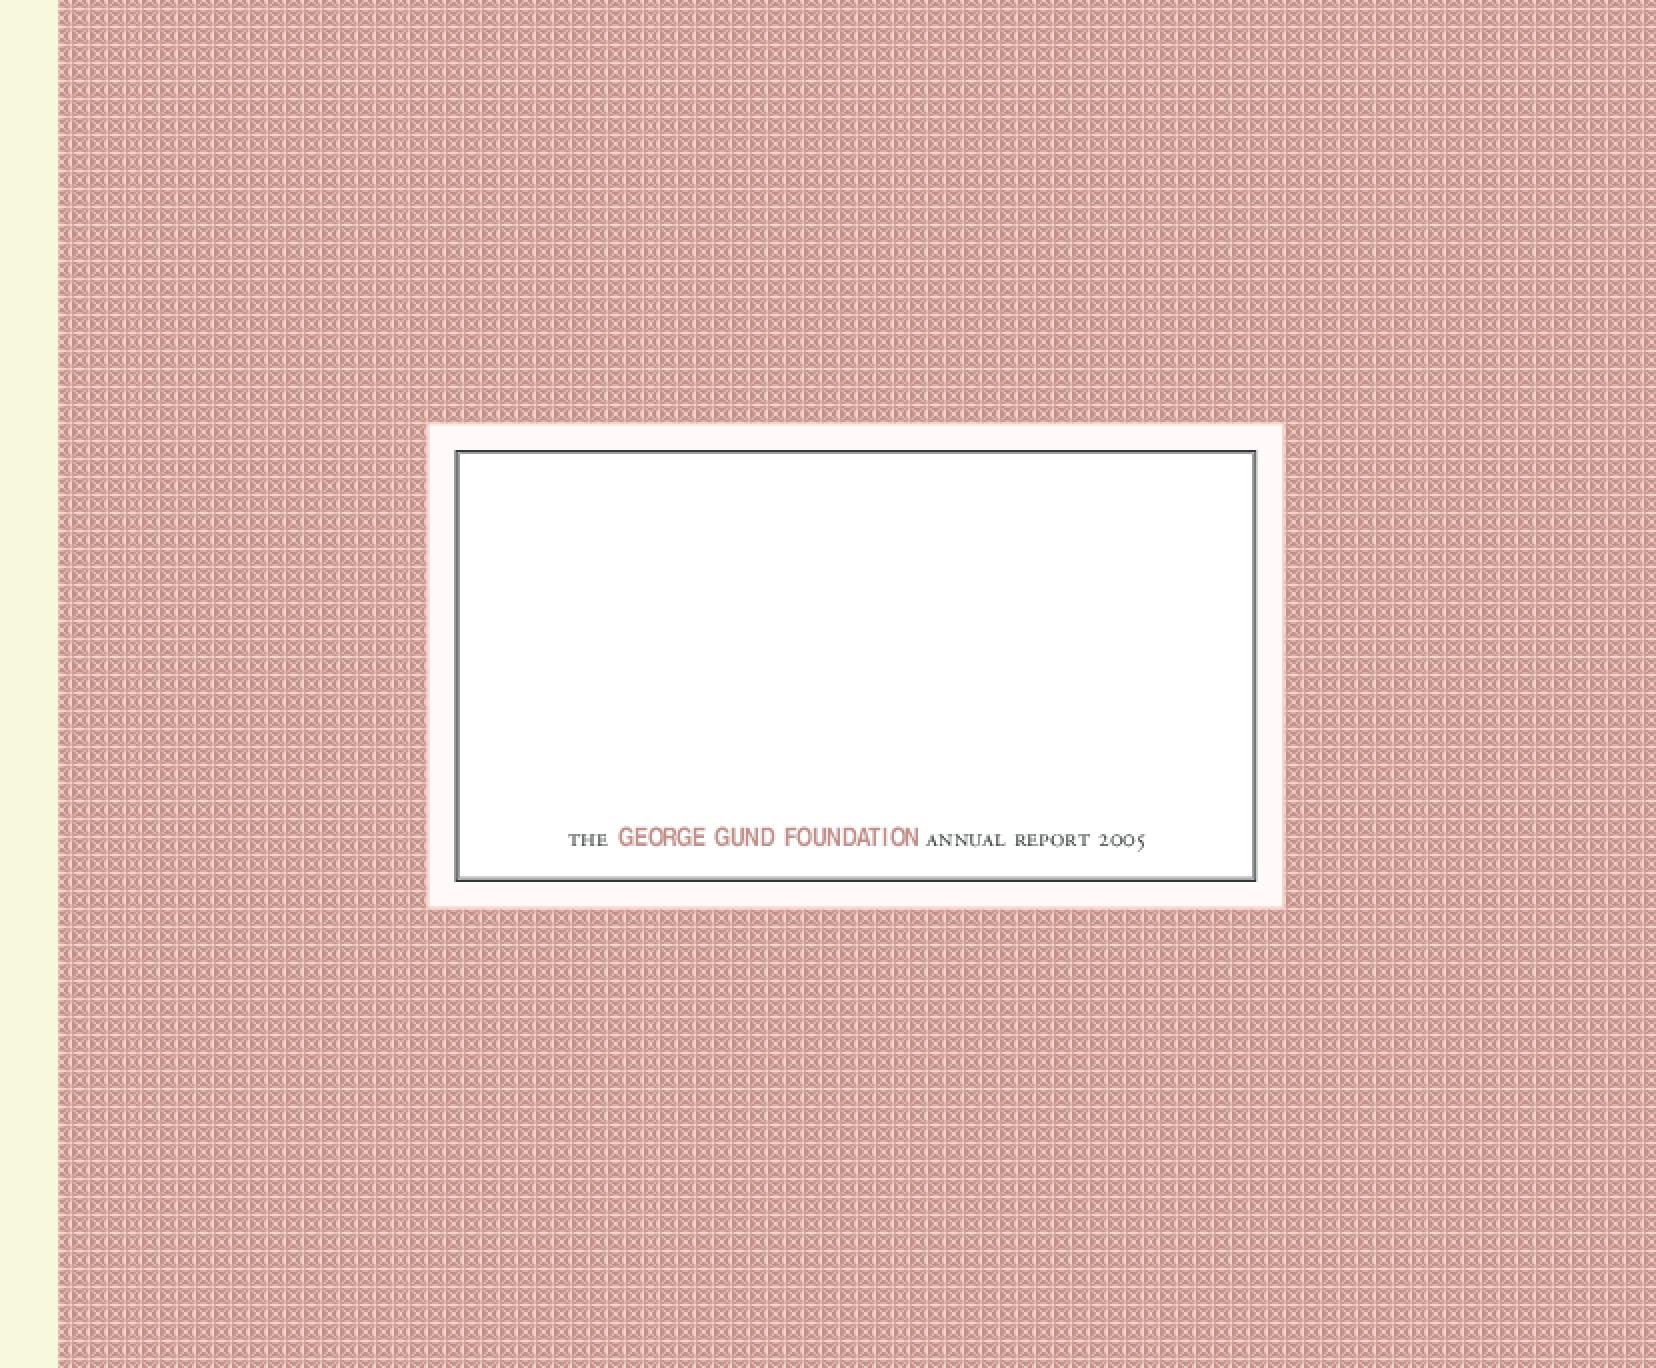 George Gund Foundation - 2005 Annual Report